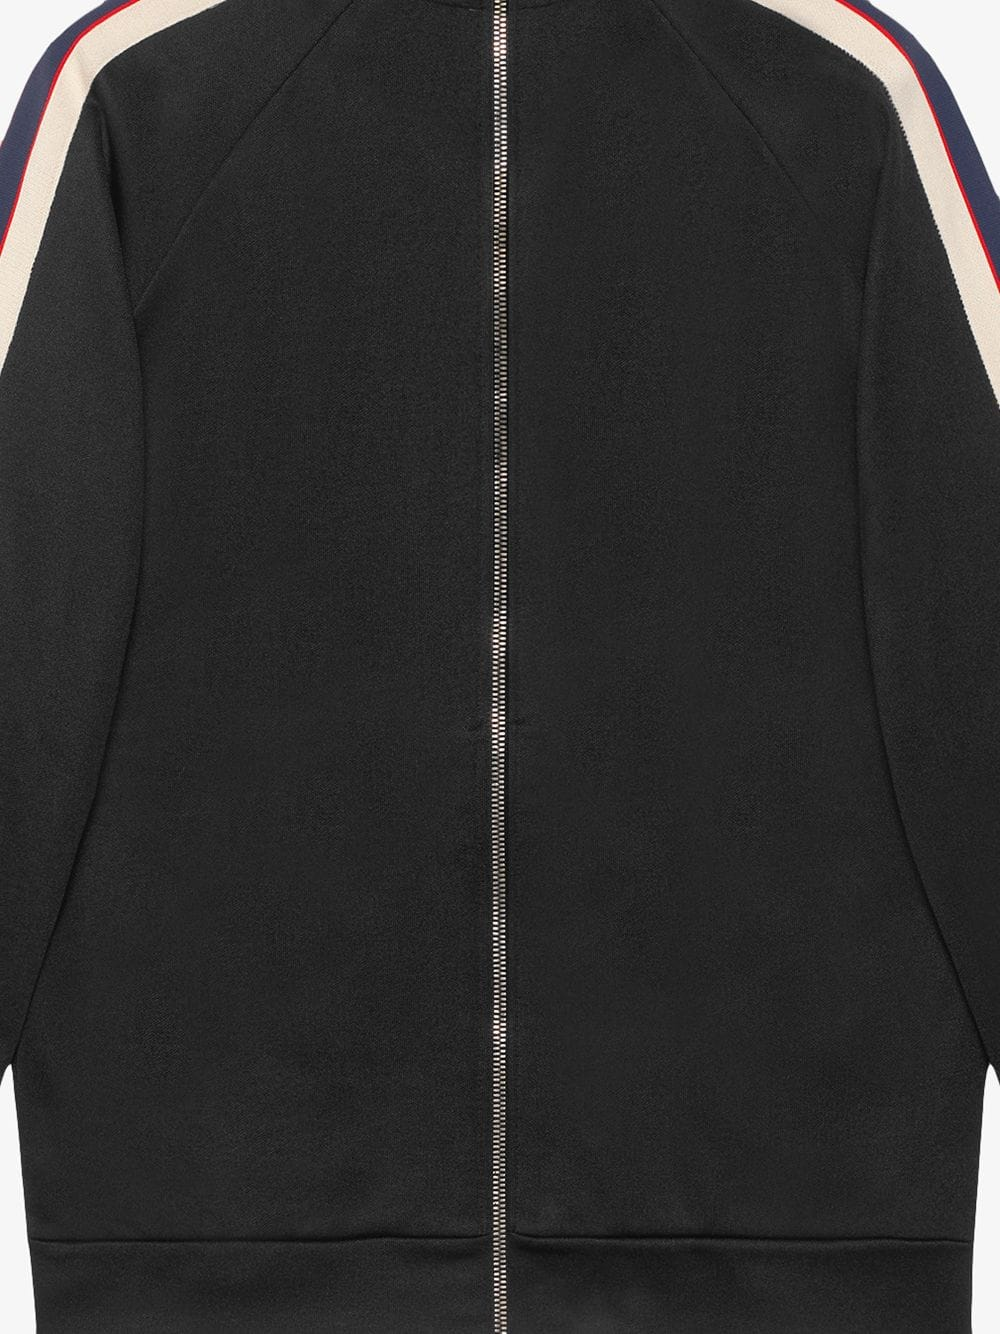 Immagine di Gucci | Jacquard Trim&Knit Zip Jacket